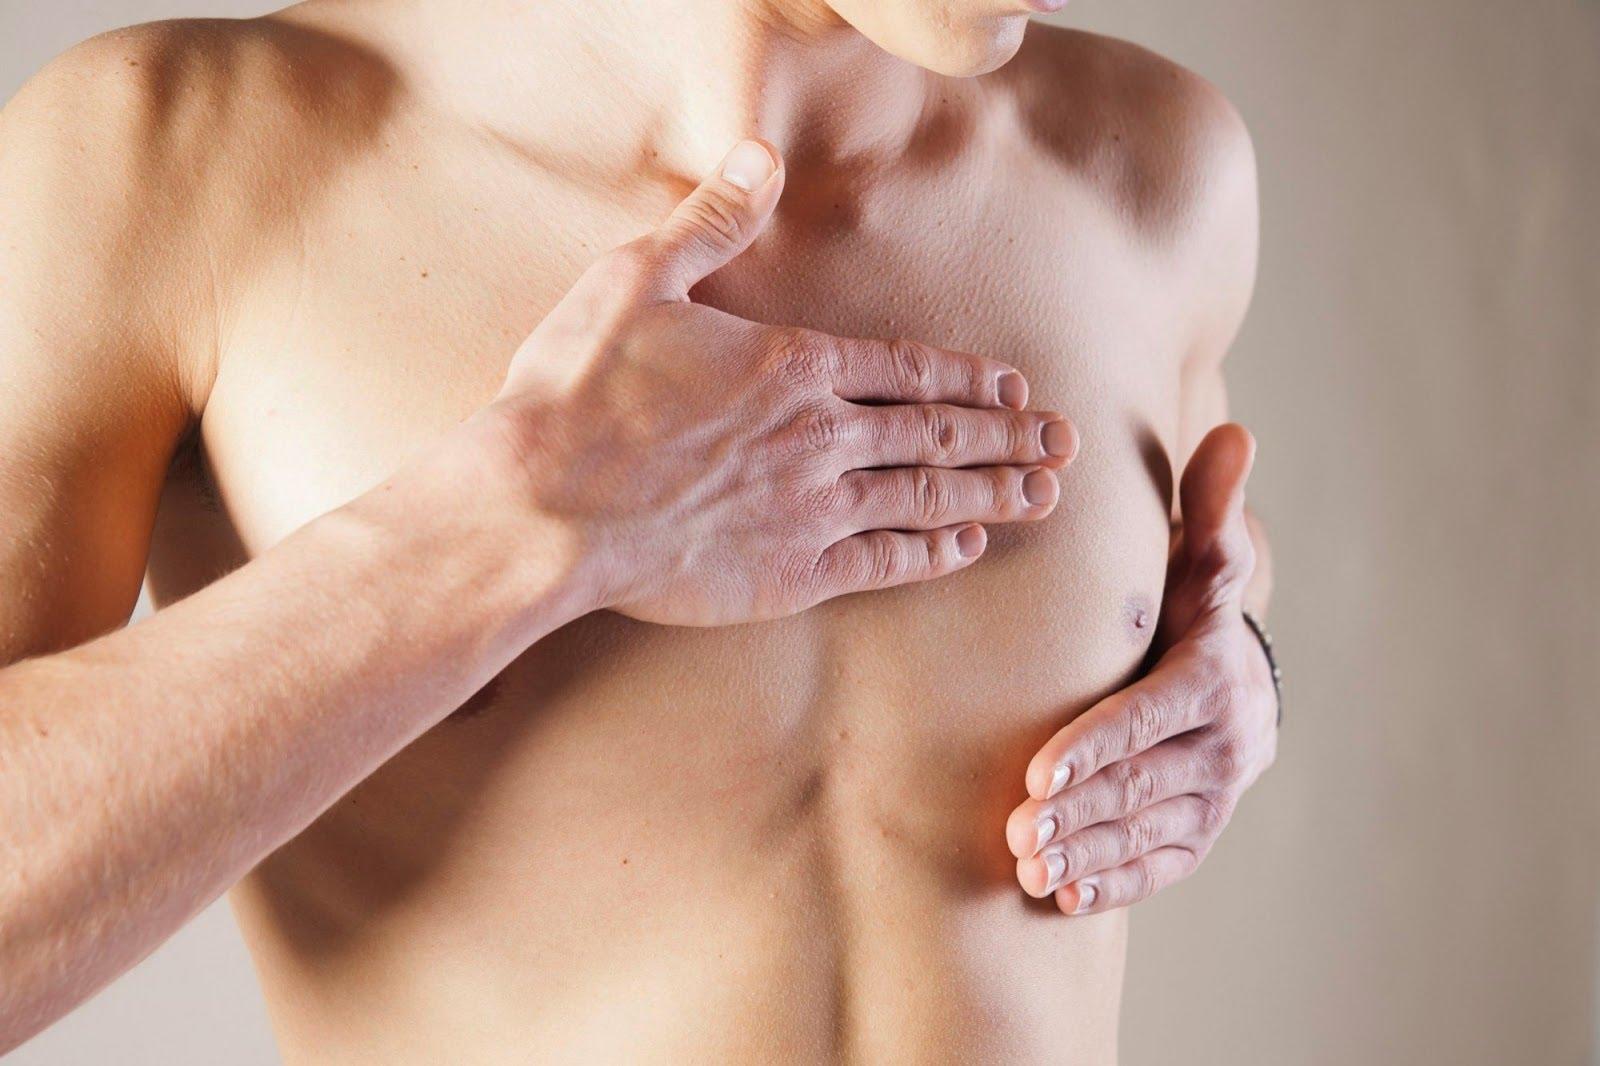 Hombres no están exentos del cáncer de mama: OMS